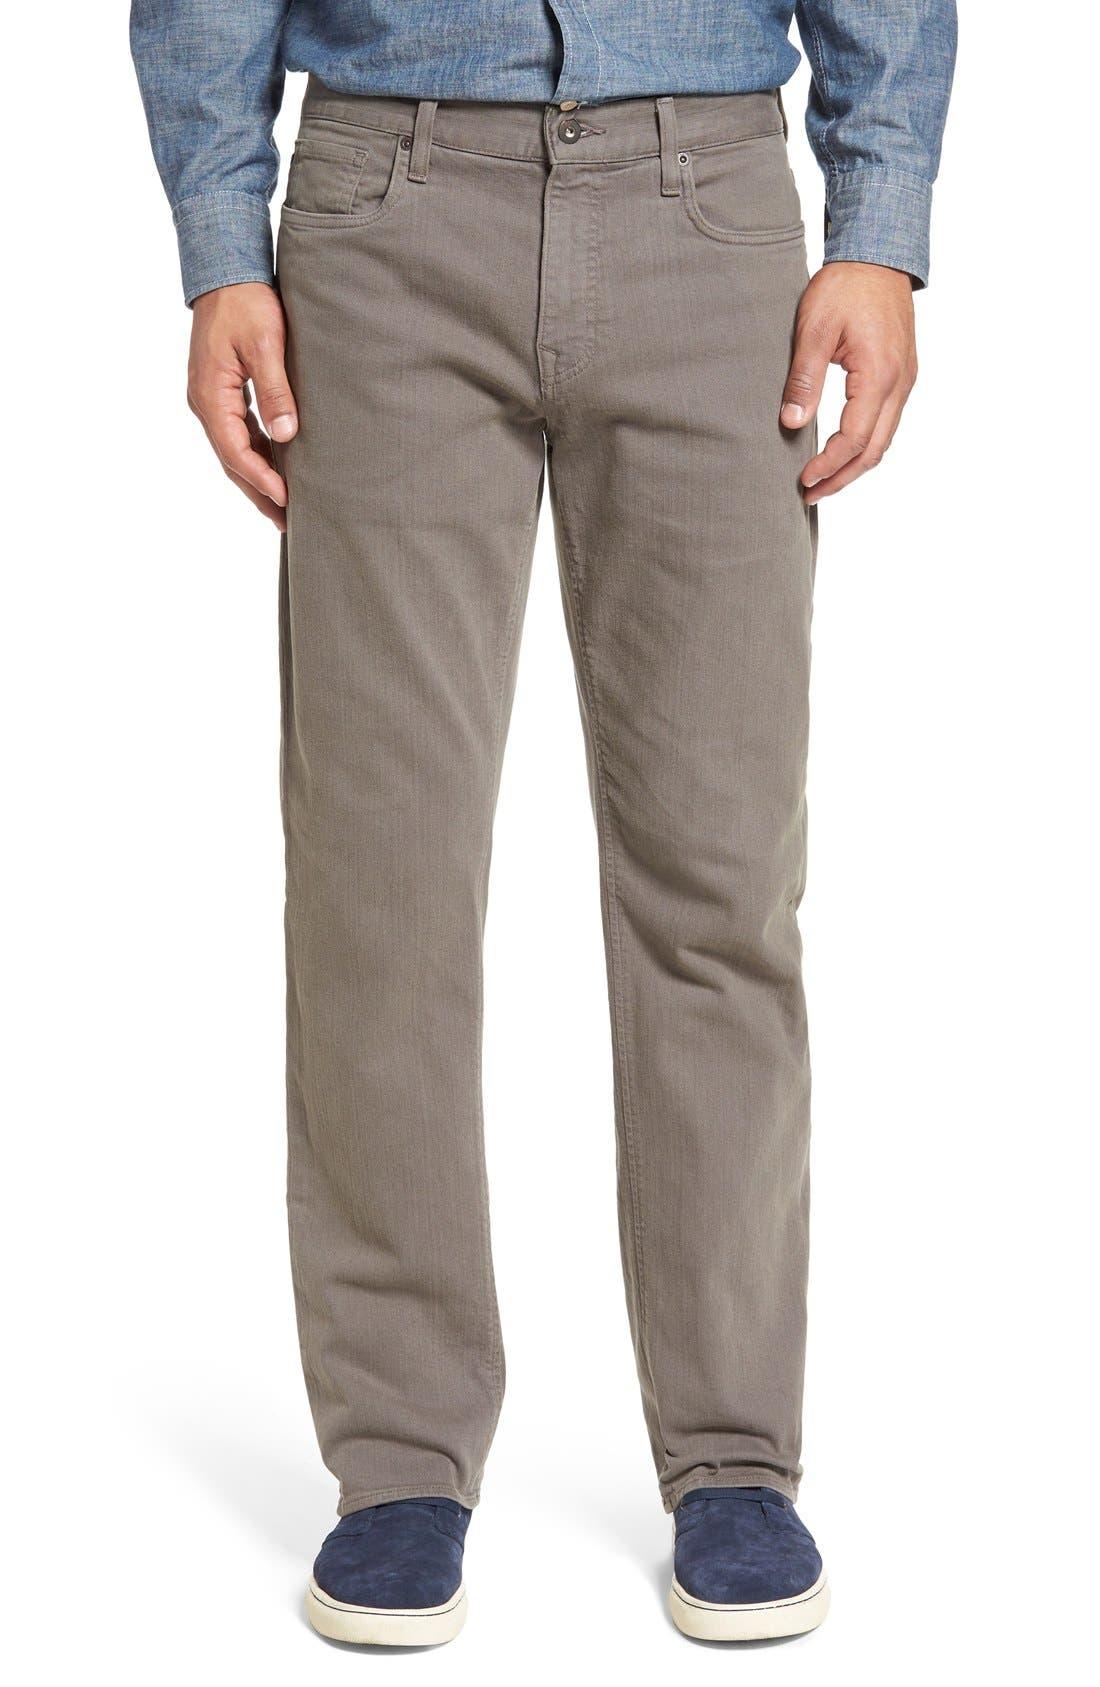 Cutter & Buck 'Greenwood' Relaxed Fit Jeans (Link) (Regular, Big & Tall)